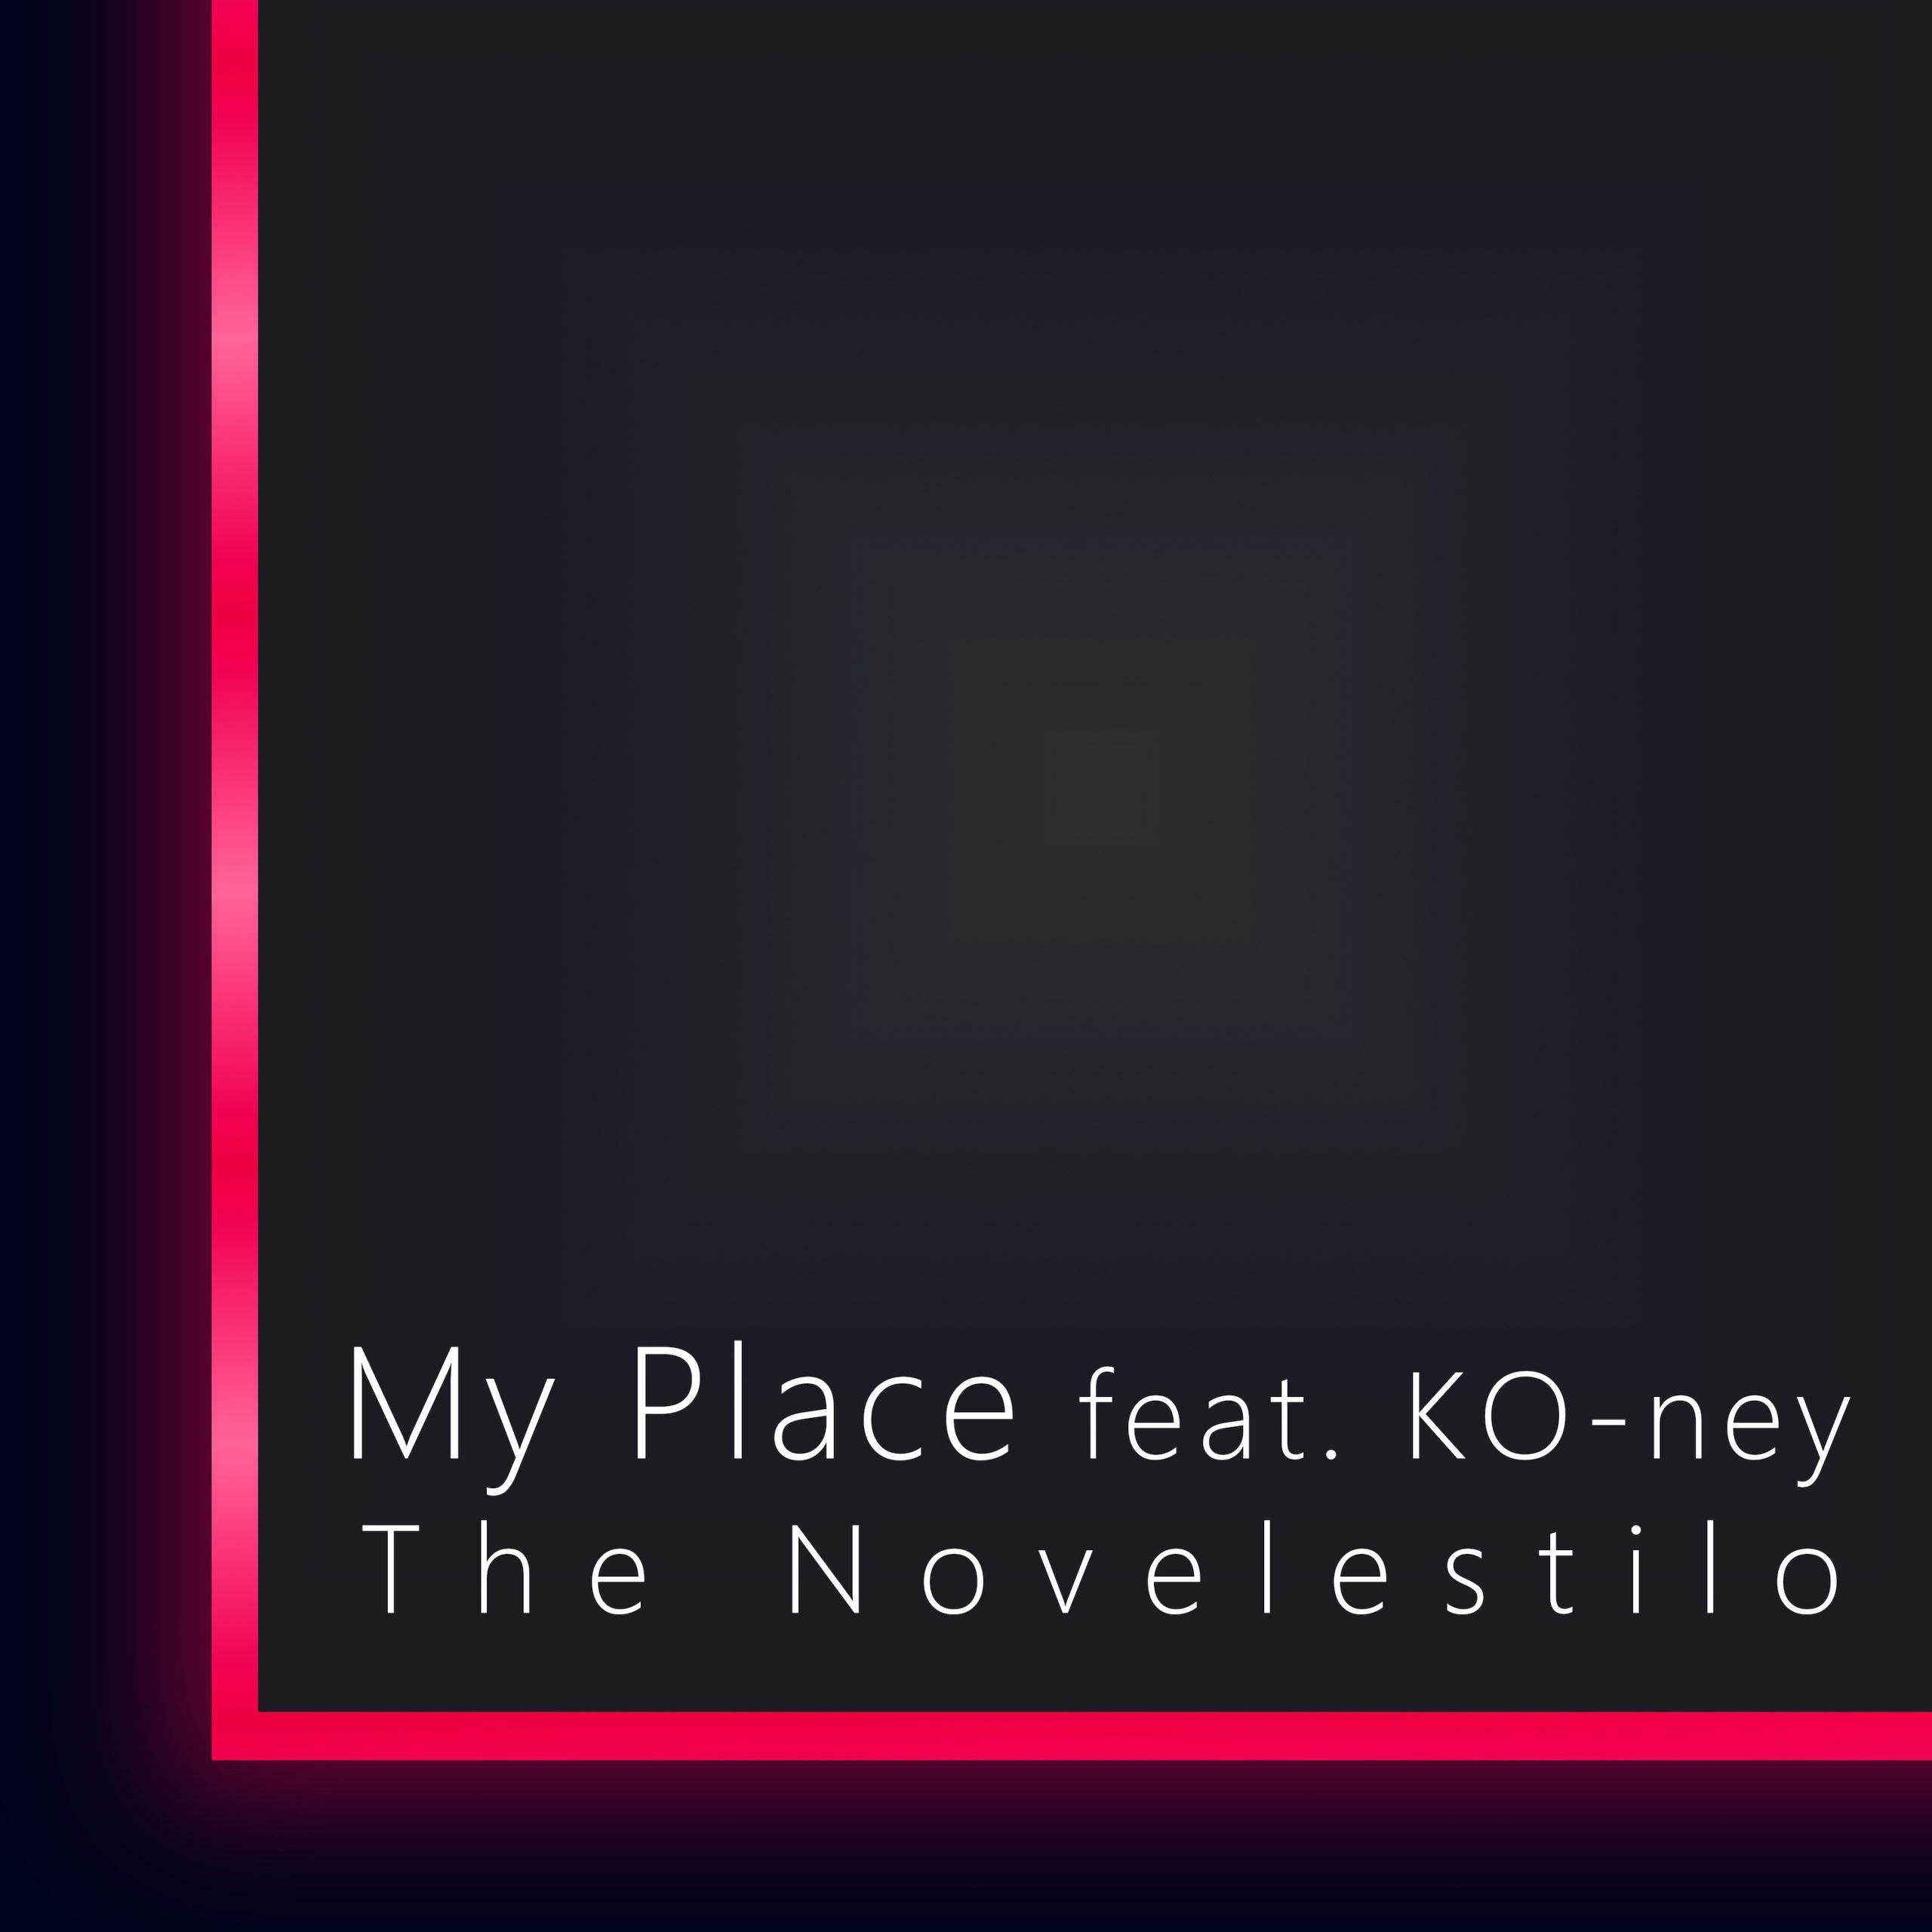 My Place feat. KO-ney